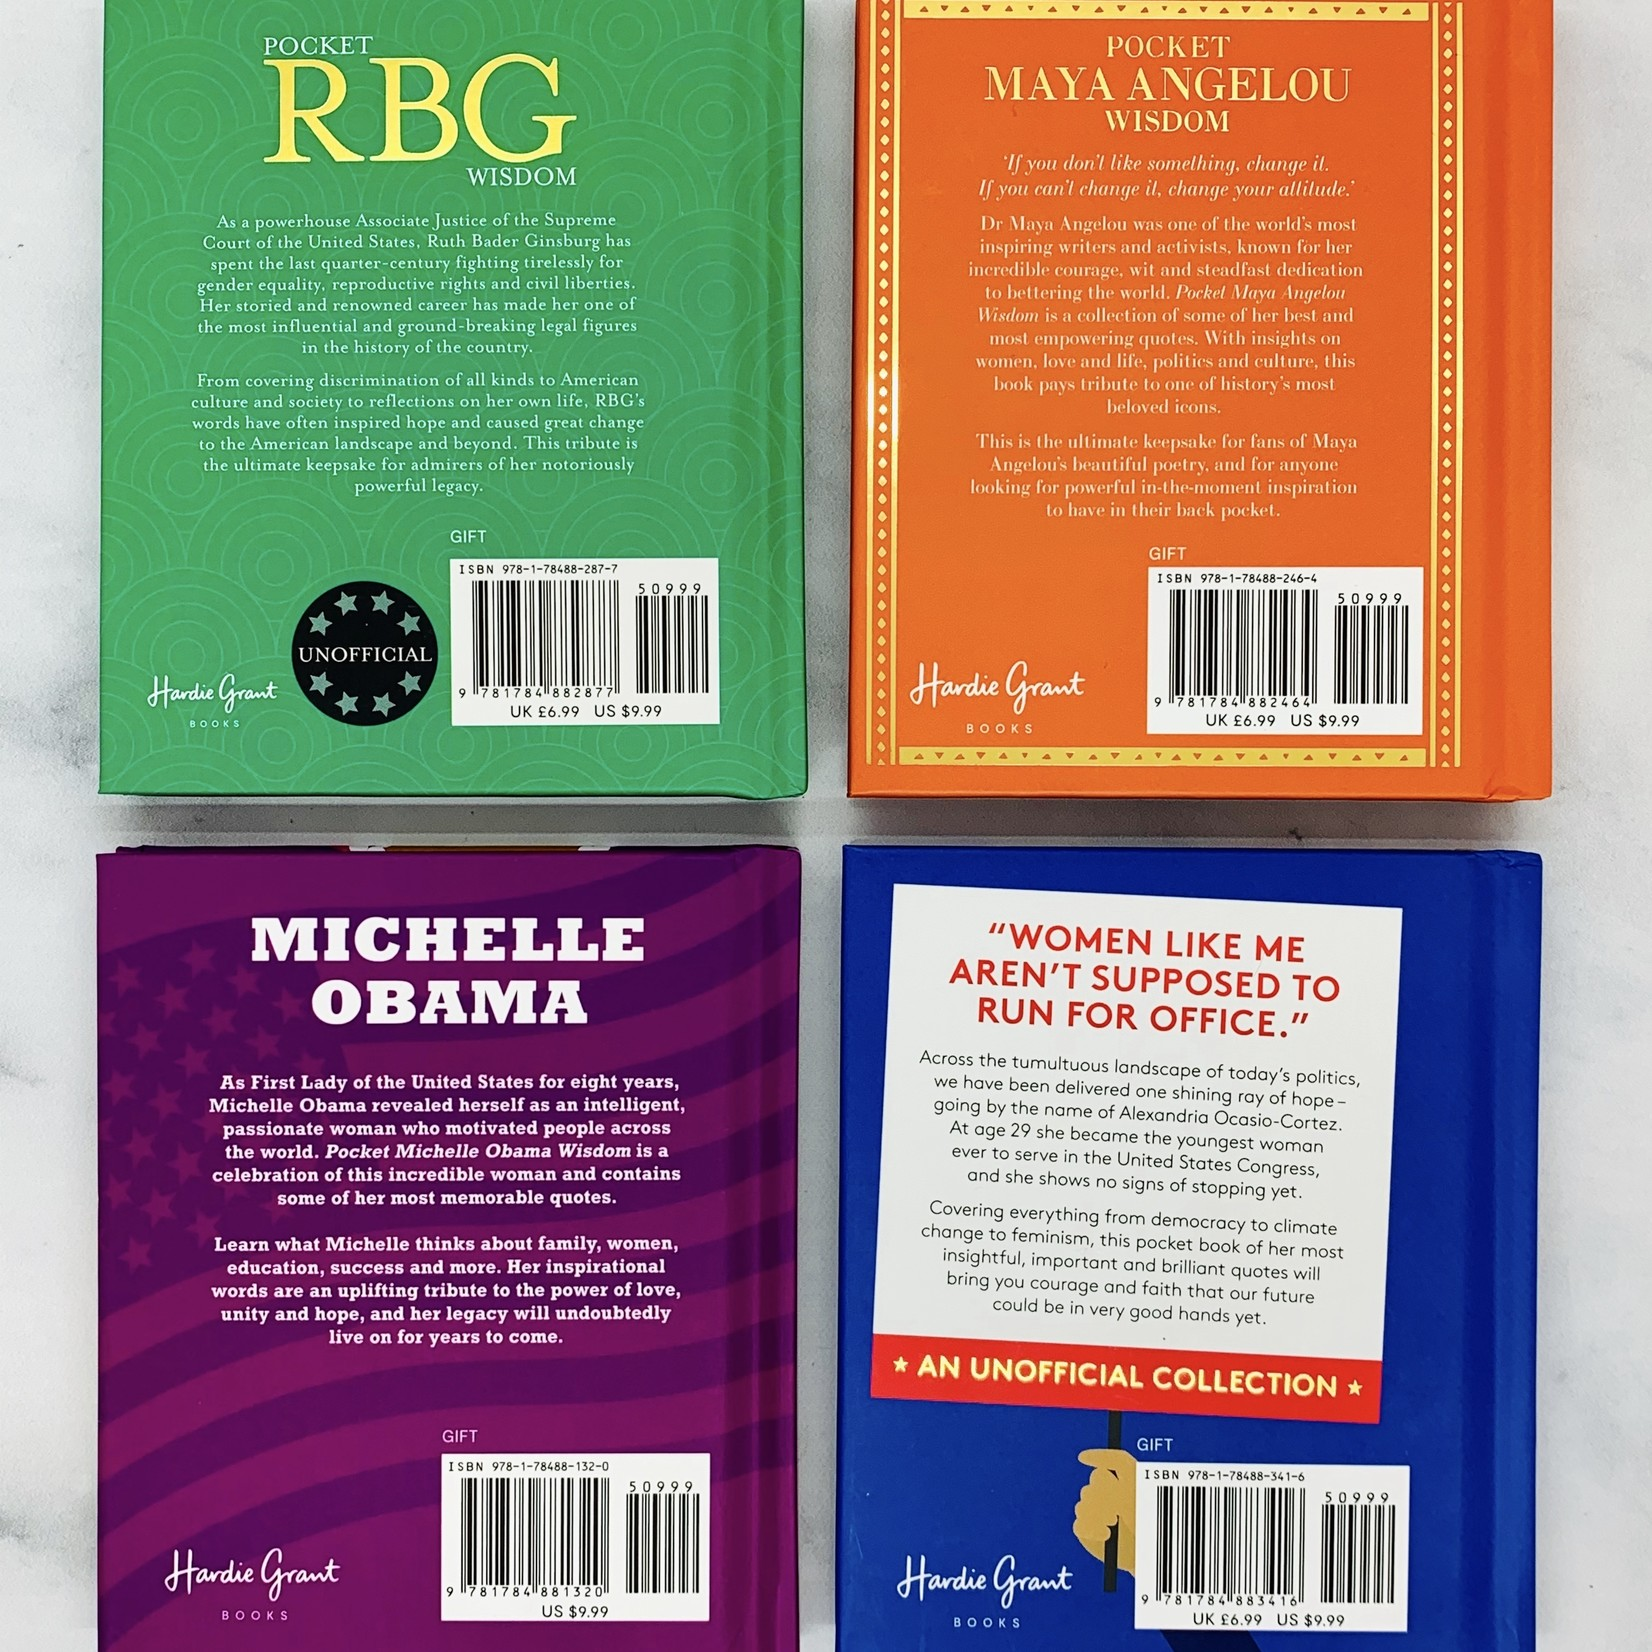 Pocket Wisdom Books